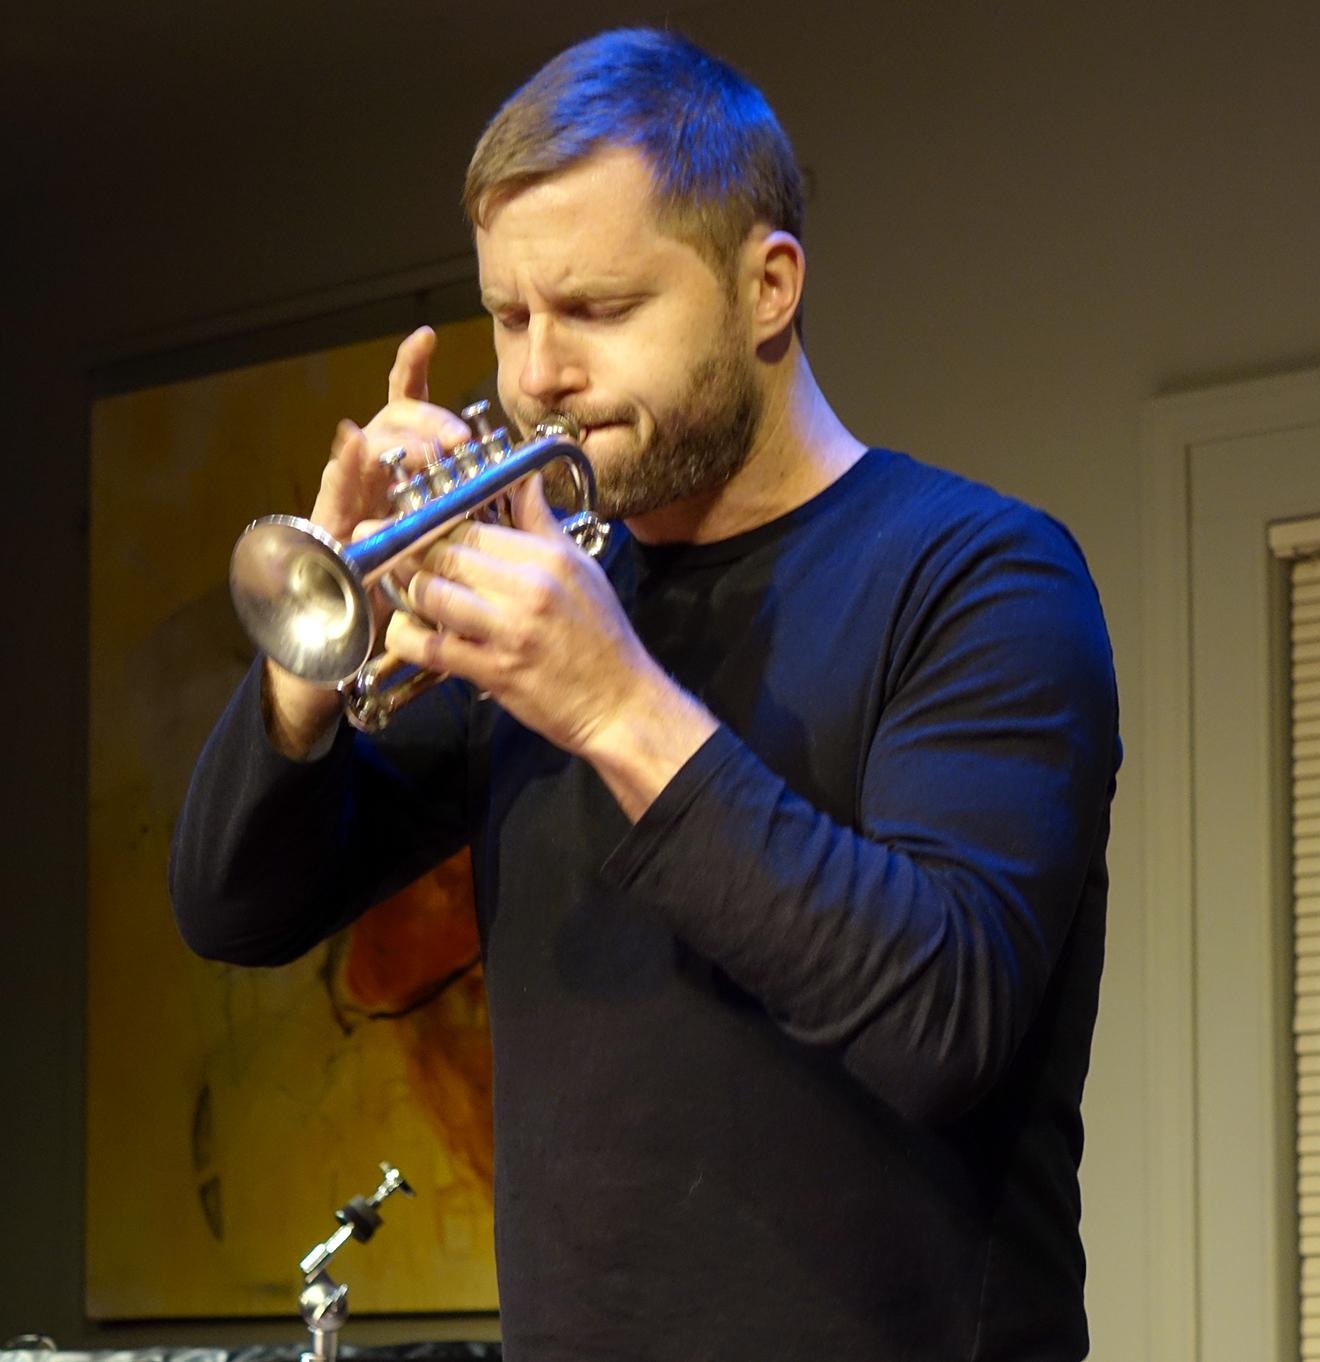 Peter Evans at Edgefest 2015